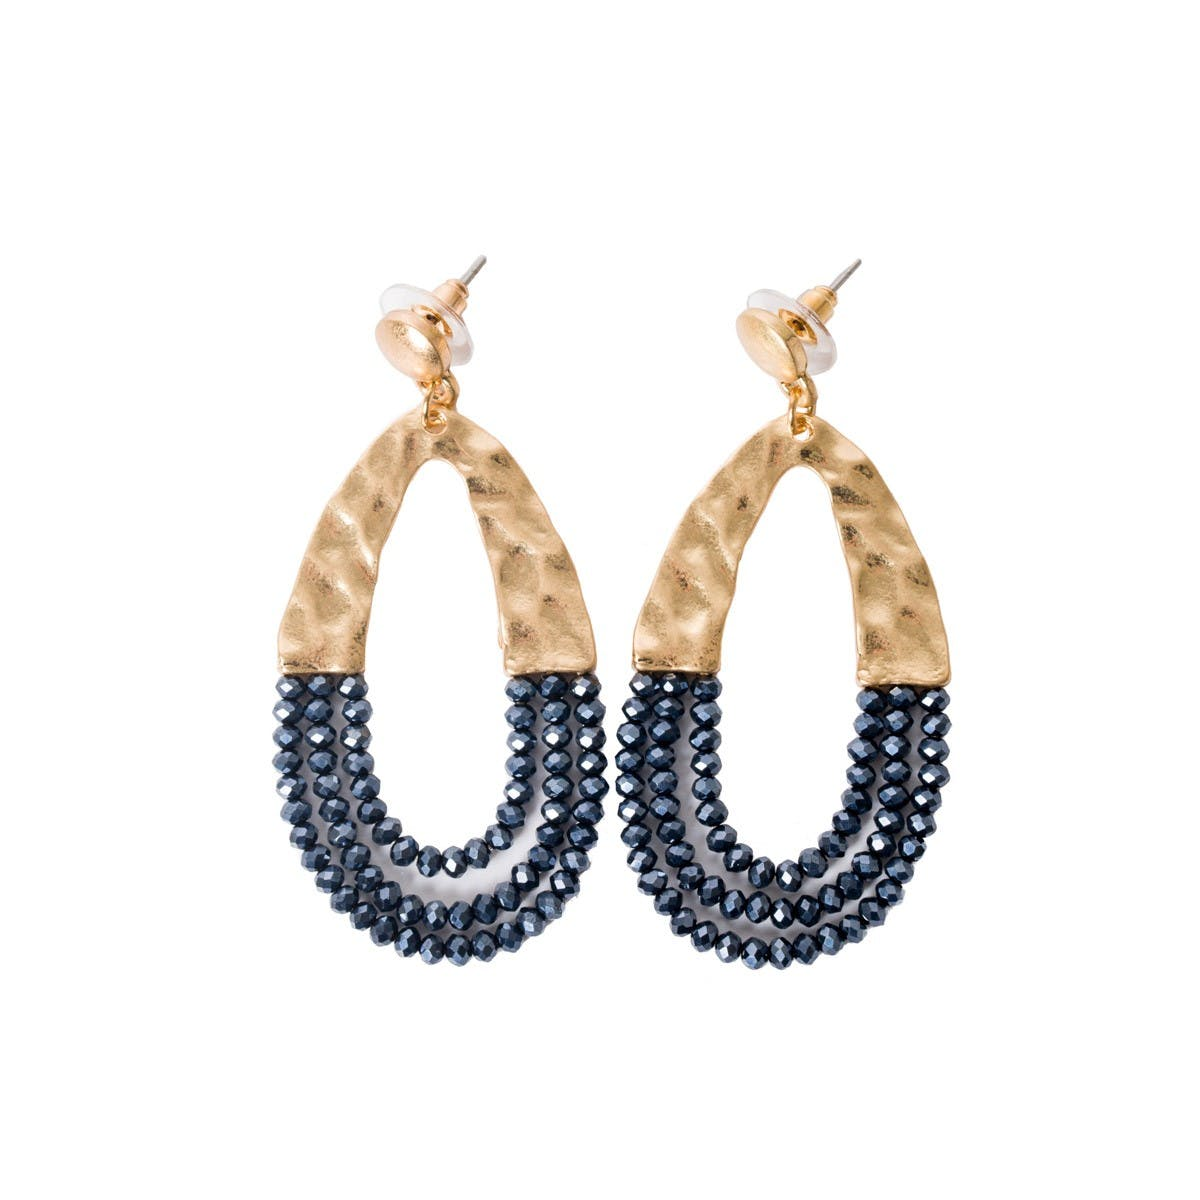 boucles d'oreille ovale zircon bleu marine